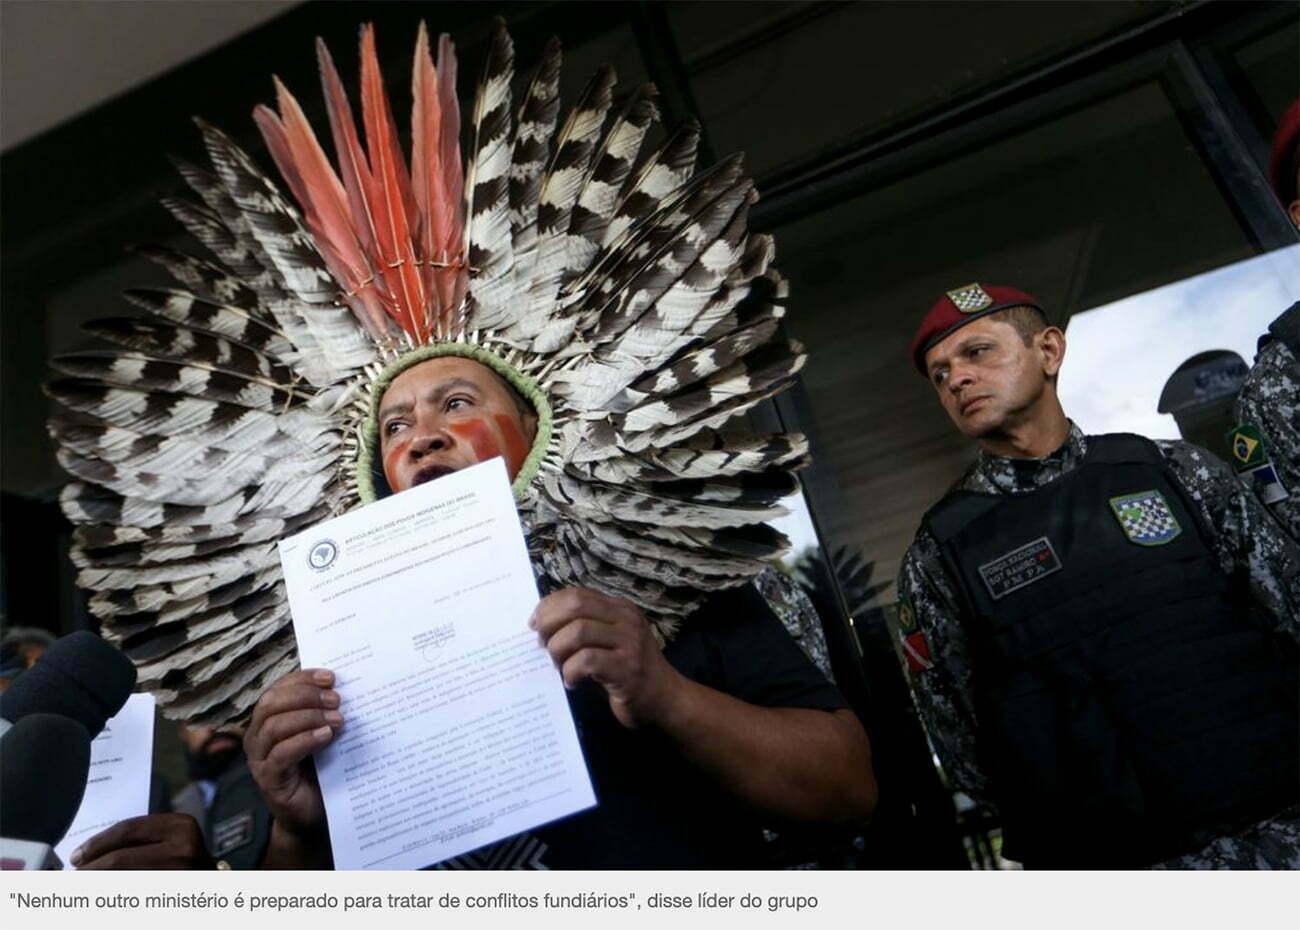 imagem de índia discursando contra política indígena de Bolsonaro.